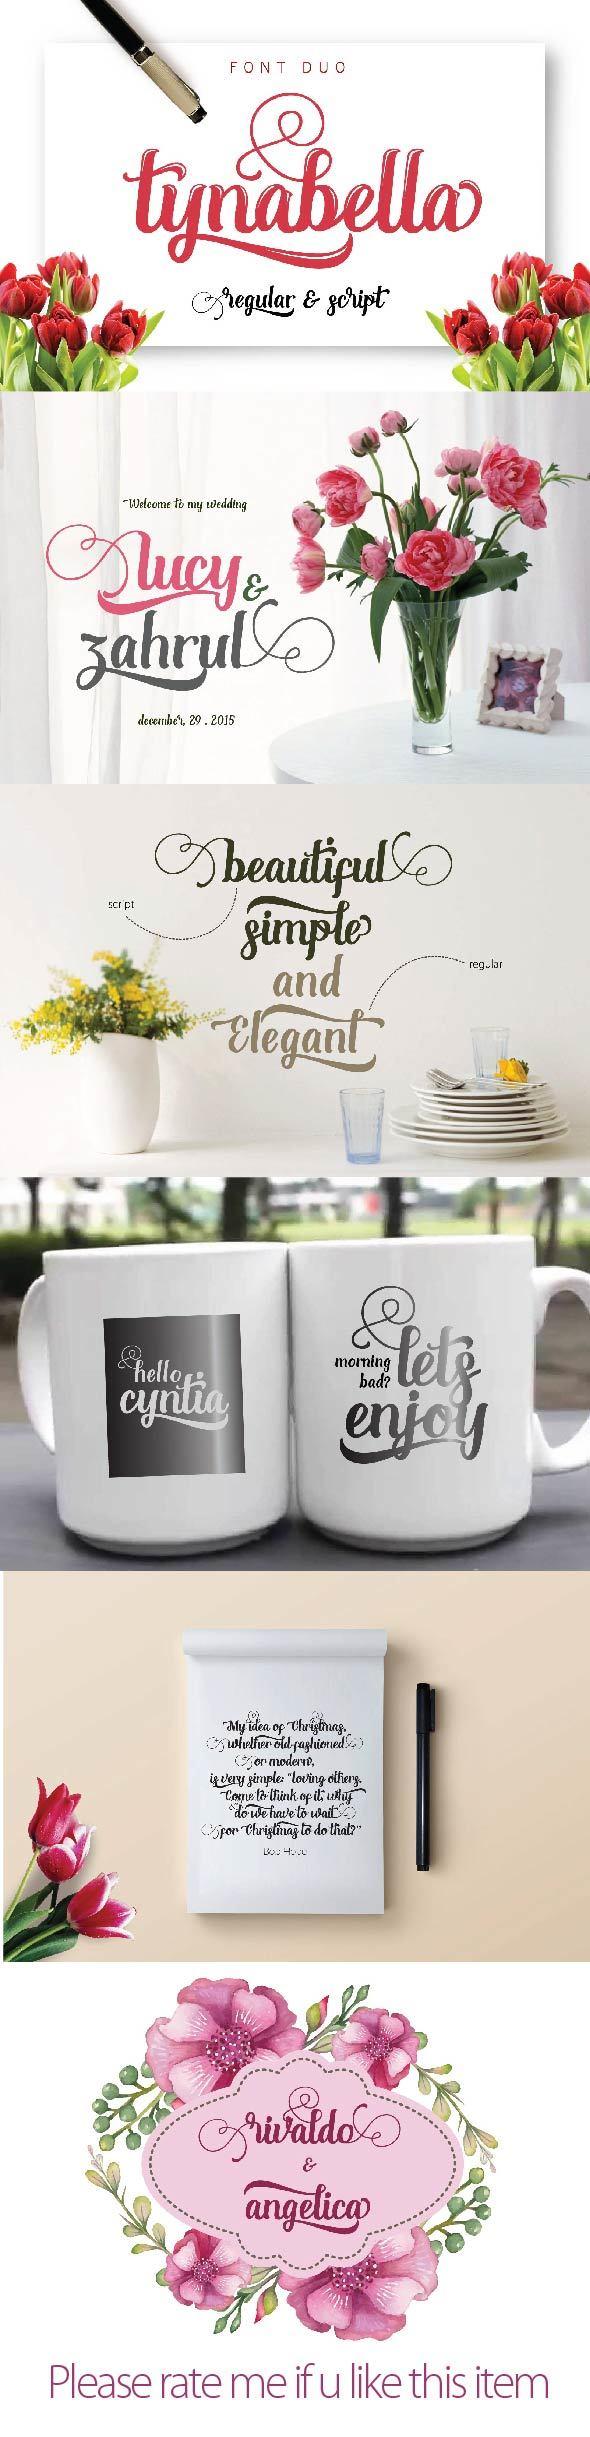 Tynabella Font Duo - Script Fonts